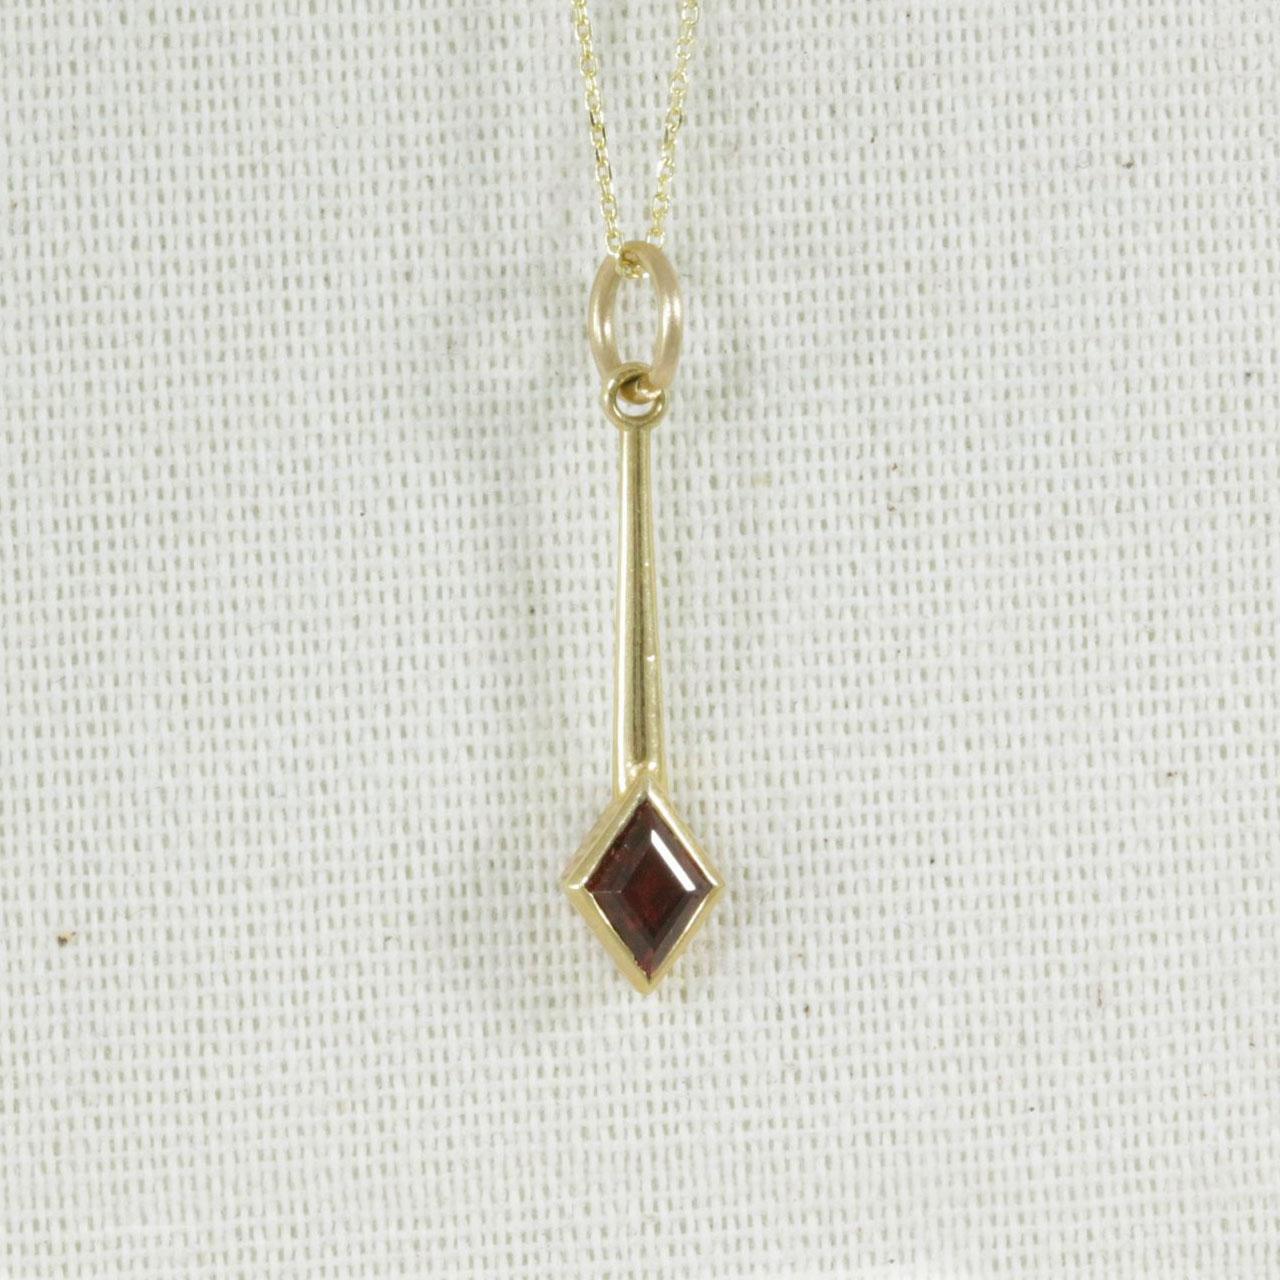 4e071d40b Solid Gold Garnet Necklace - Handmade by ABANA Jewellers